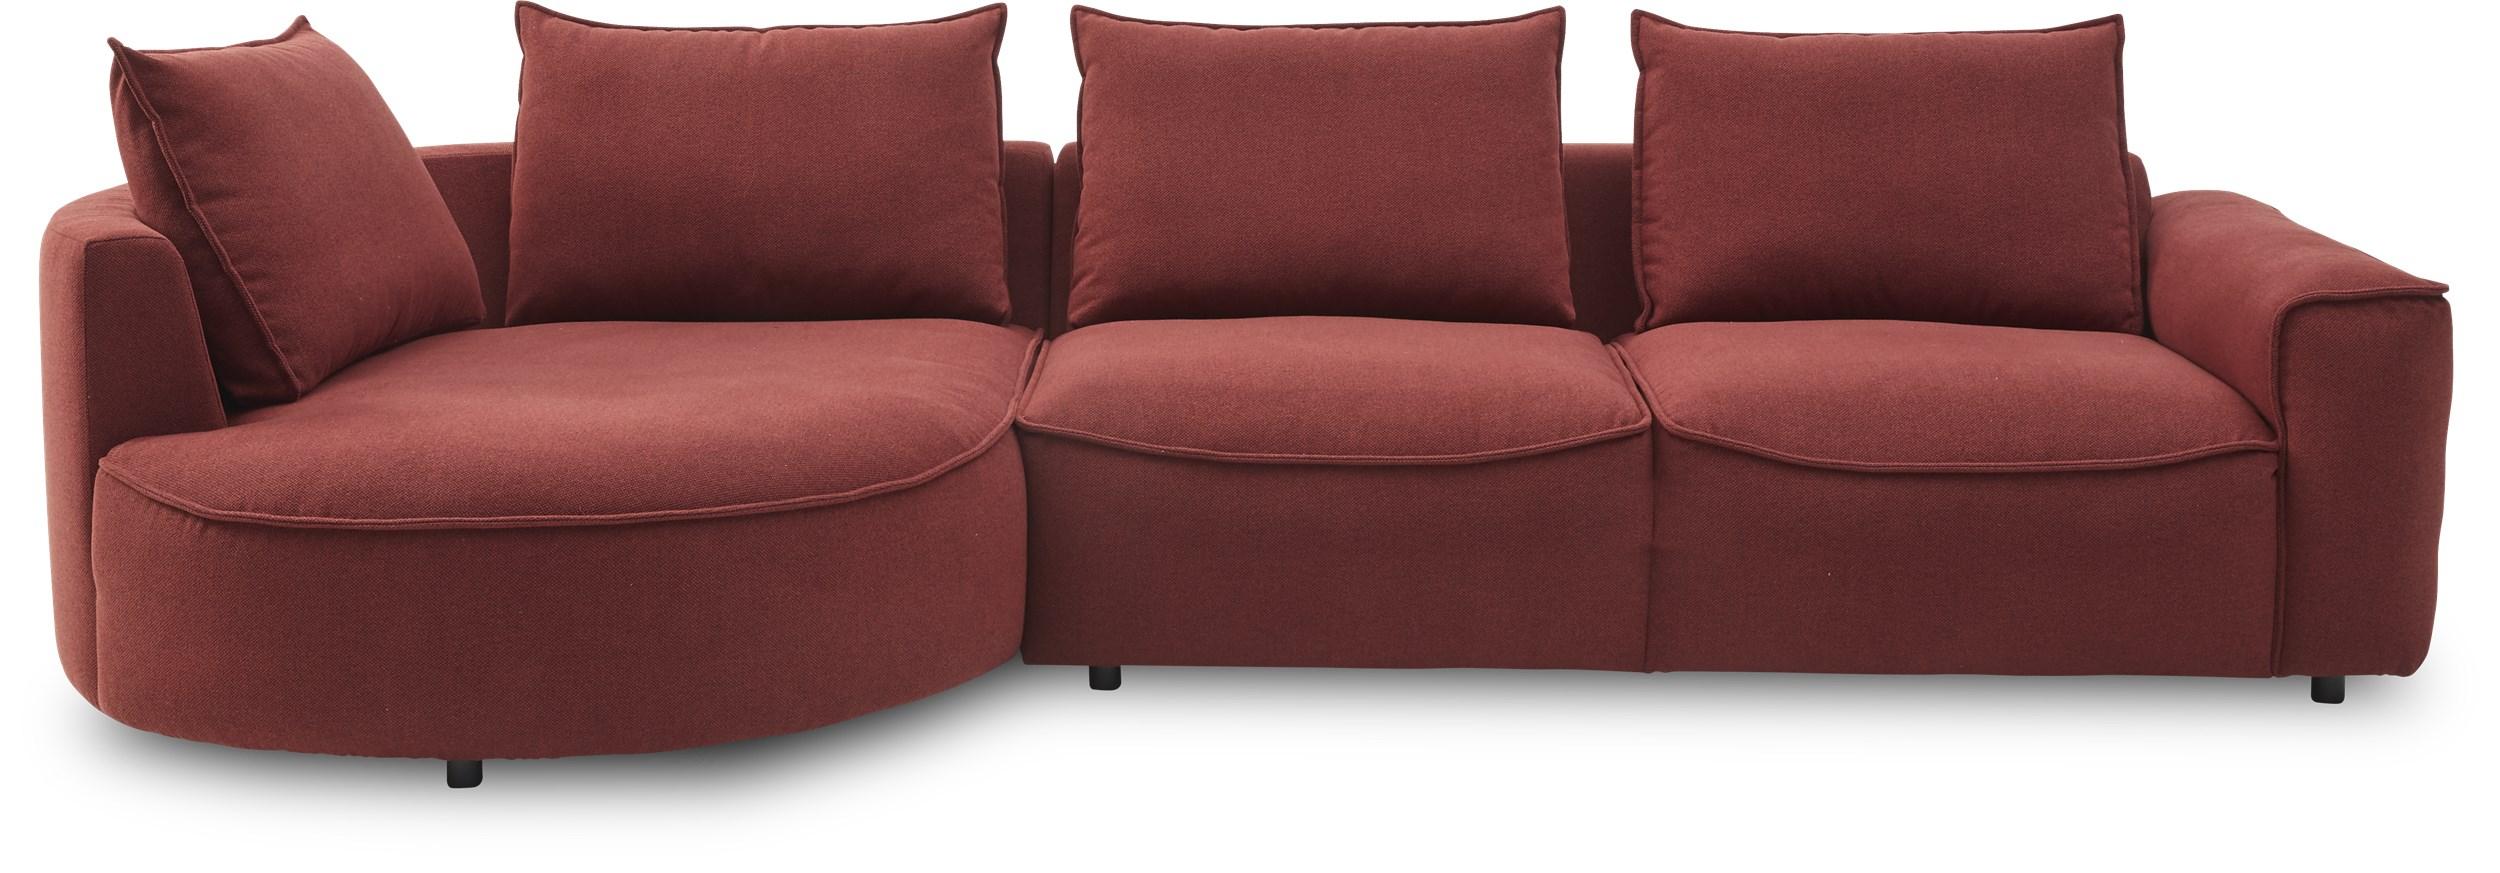 Samone Sofa Med Chaiselong